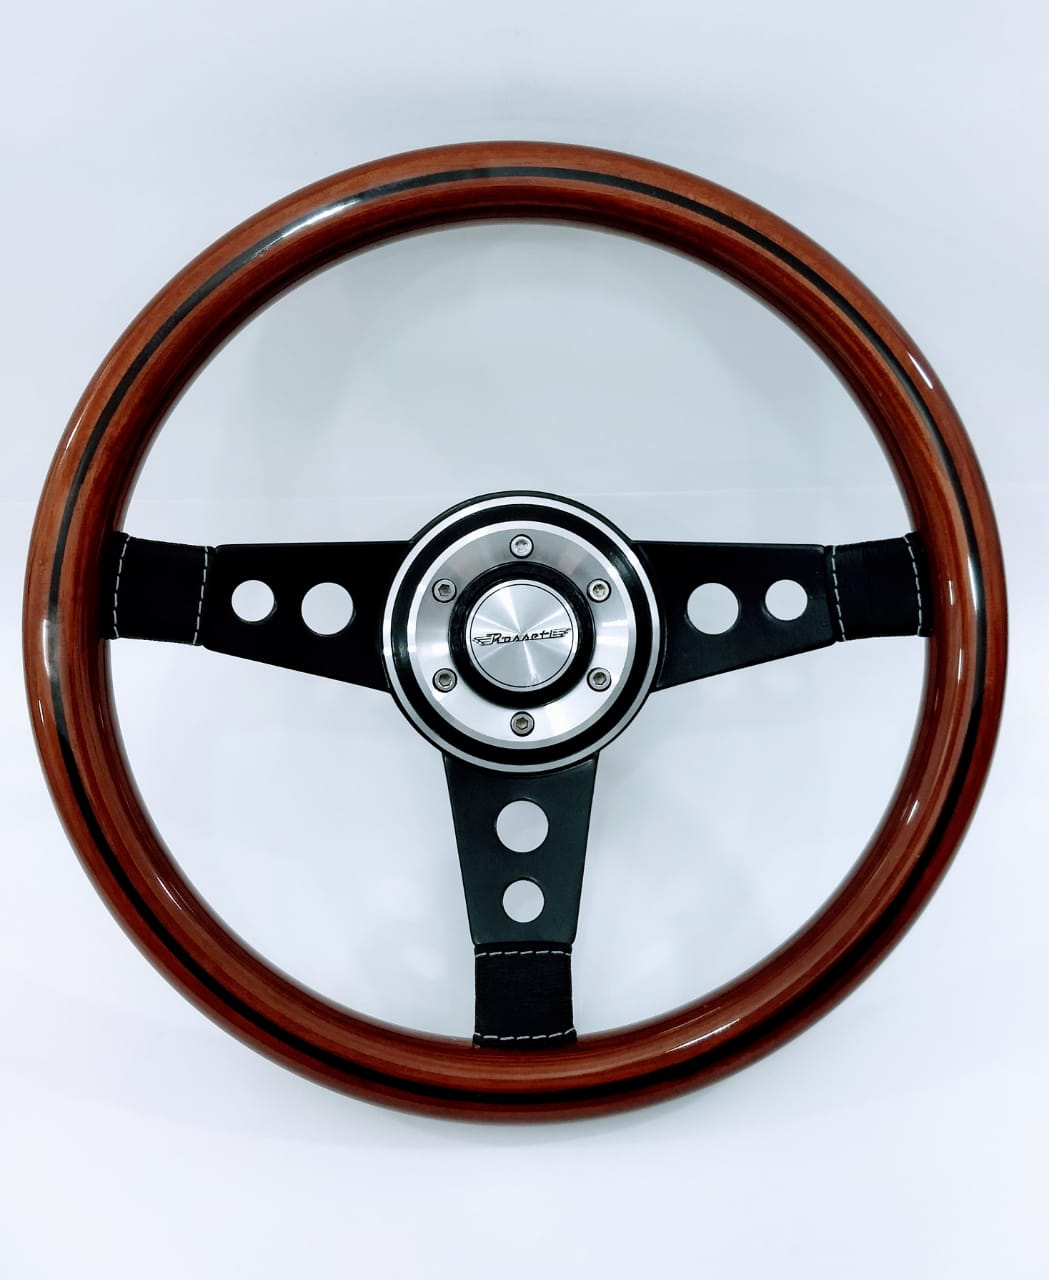 Volante Lenker Racing Madeira Haste Preta